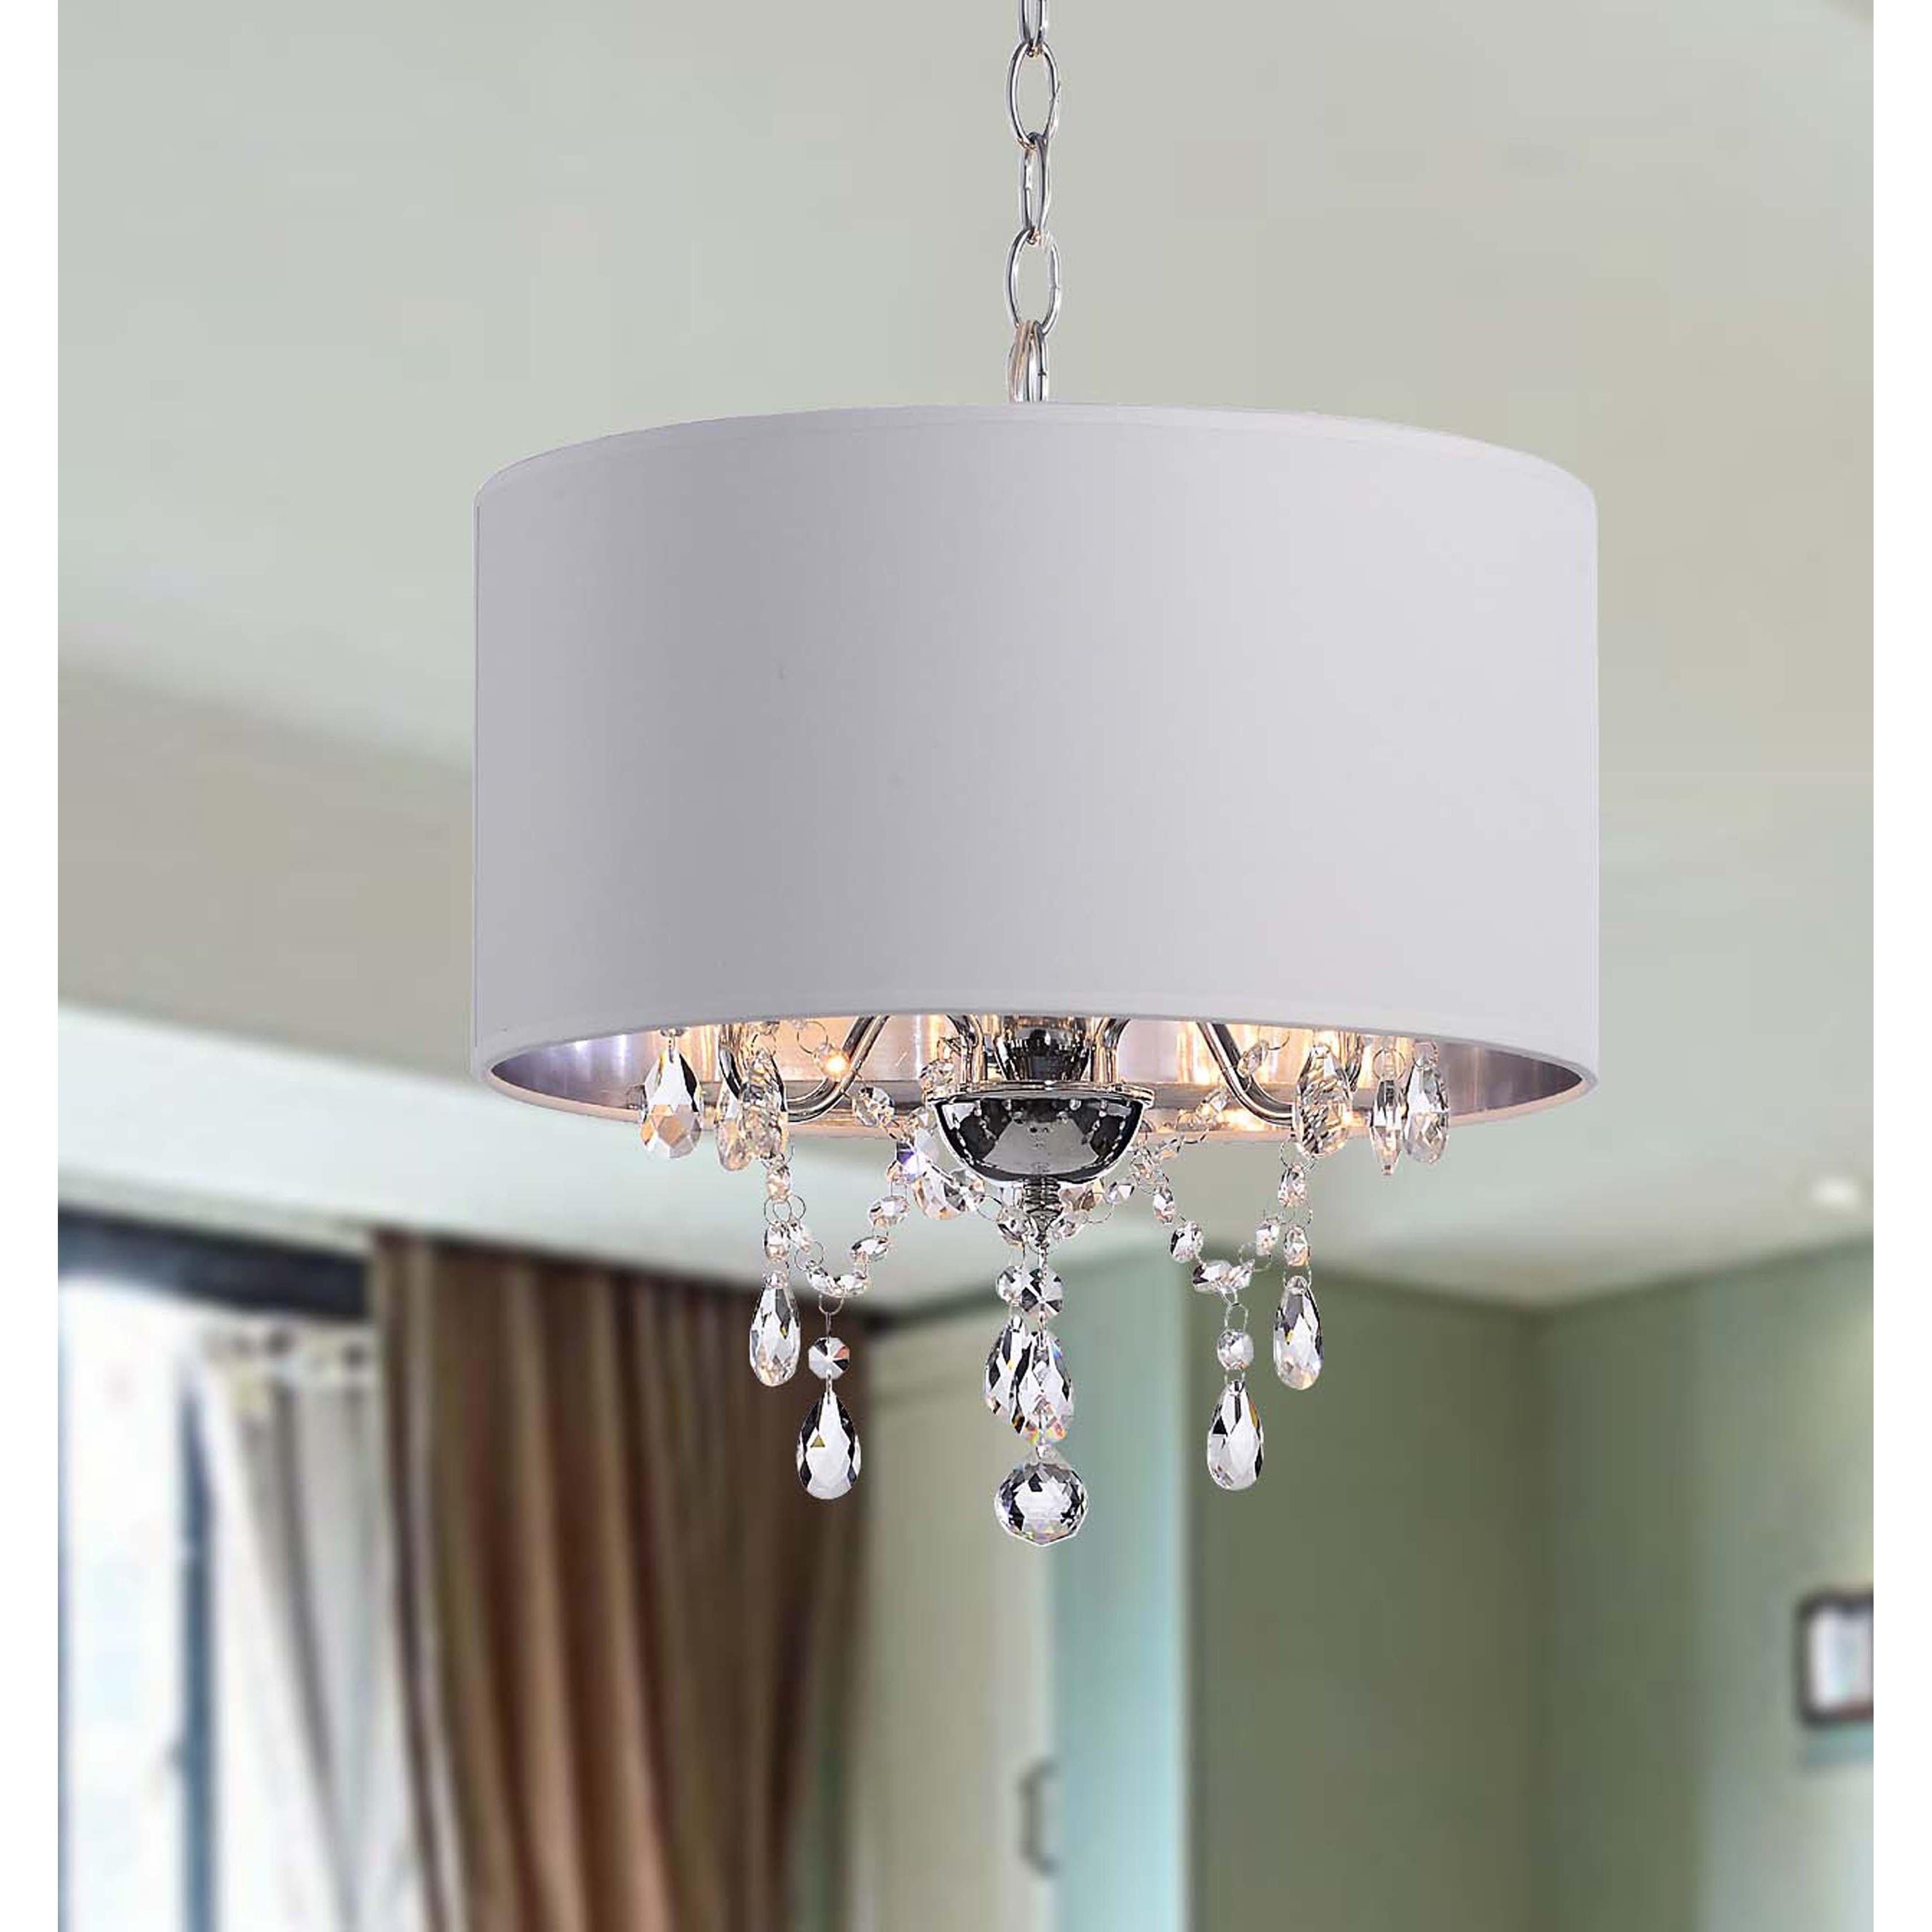 Shop indoor 3 light white chrome pendant chandelier free shipping indoor 3 light white chrome pendant chandelier aloadofball Choice Image